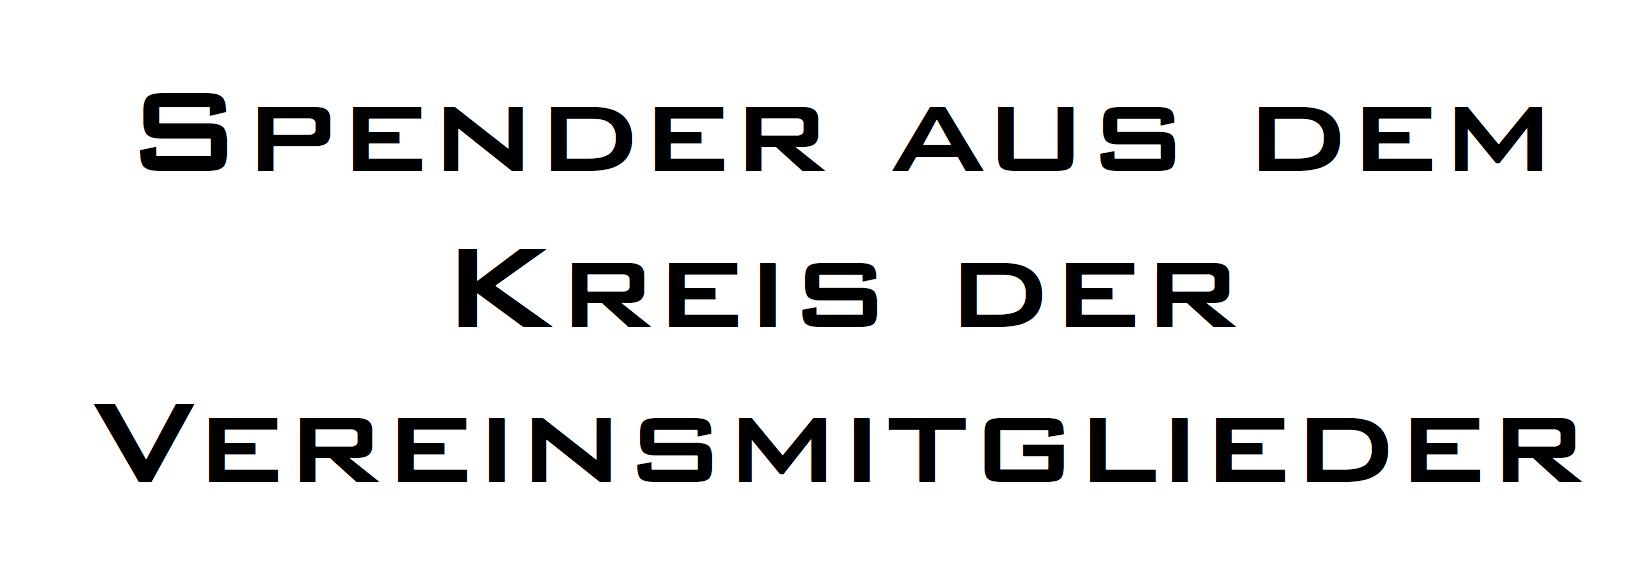 Microsoft Word - Spender .docx